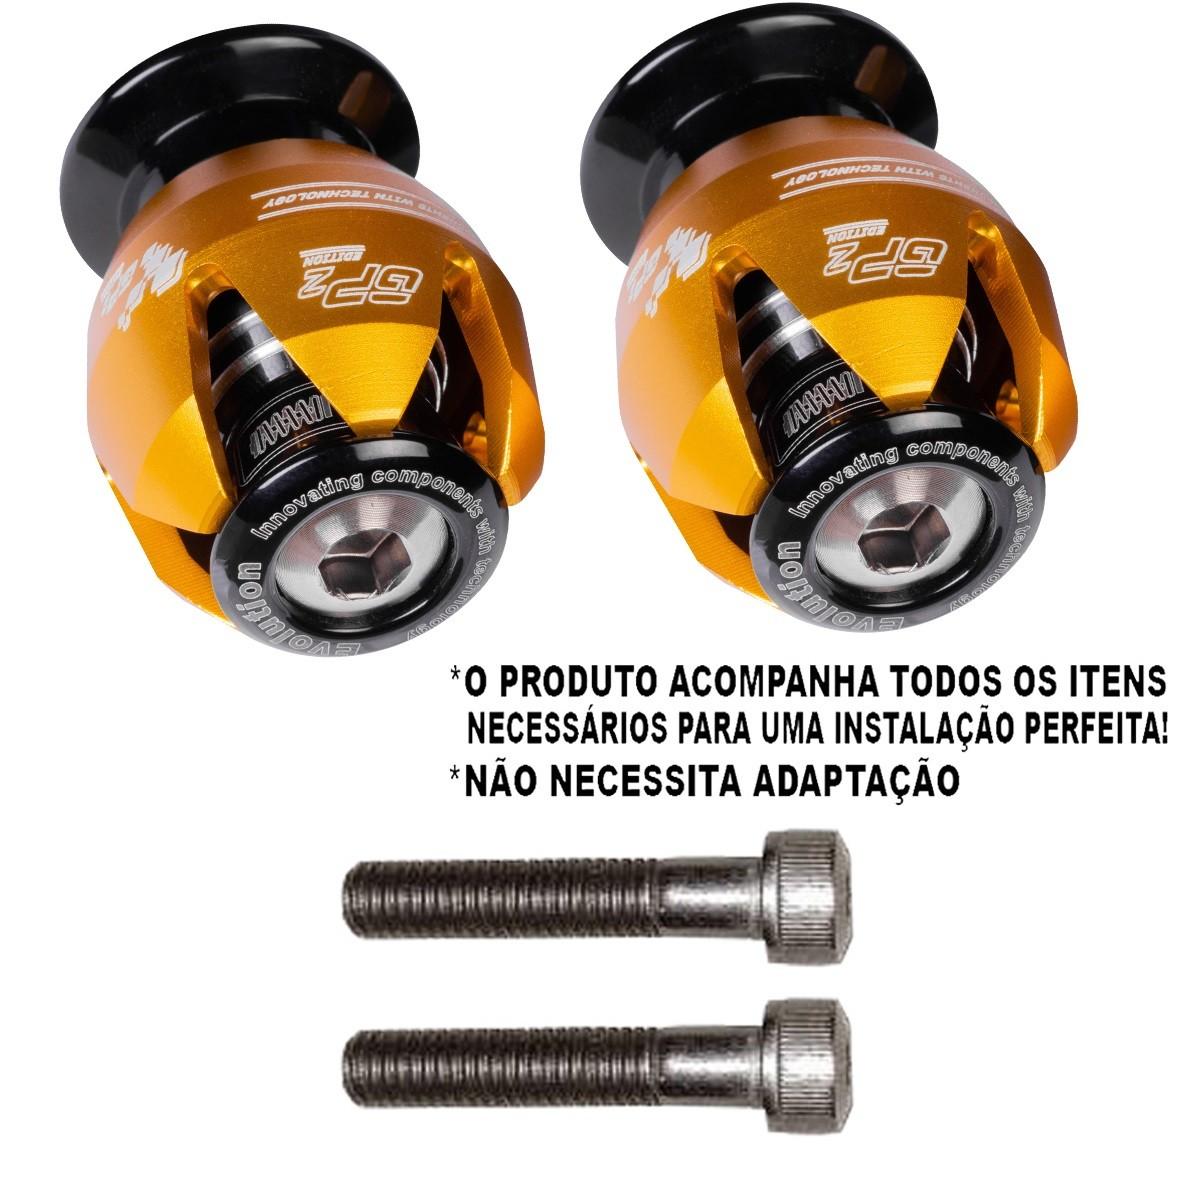 Slider traseiro ninja 250r 2012 2013 2014 2015 2016 2017 2018 2019 2020 balança kawasaki gp2 edition